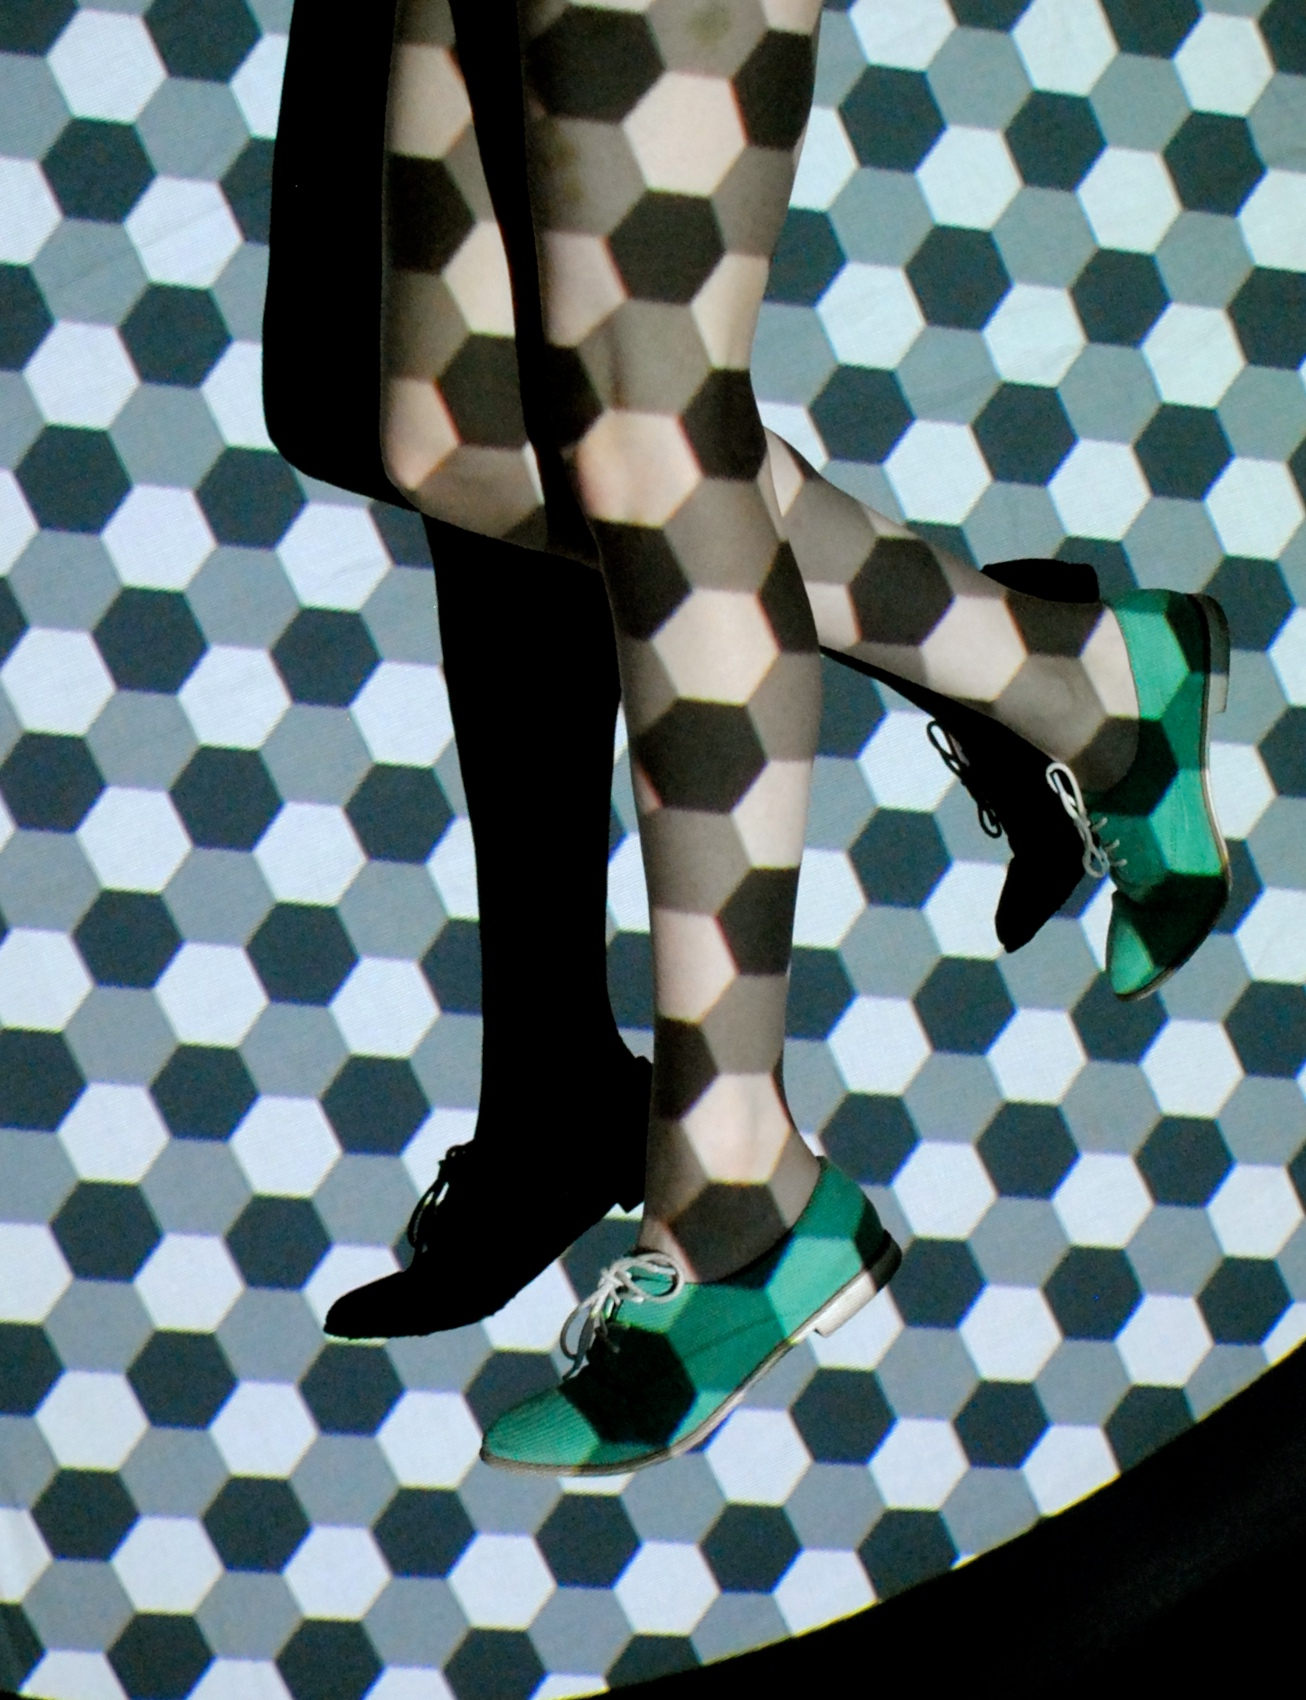 Grid Cells Hexagons